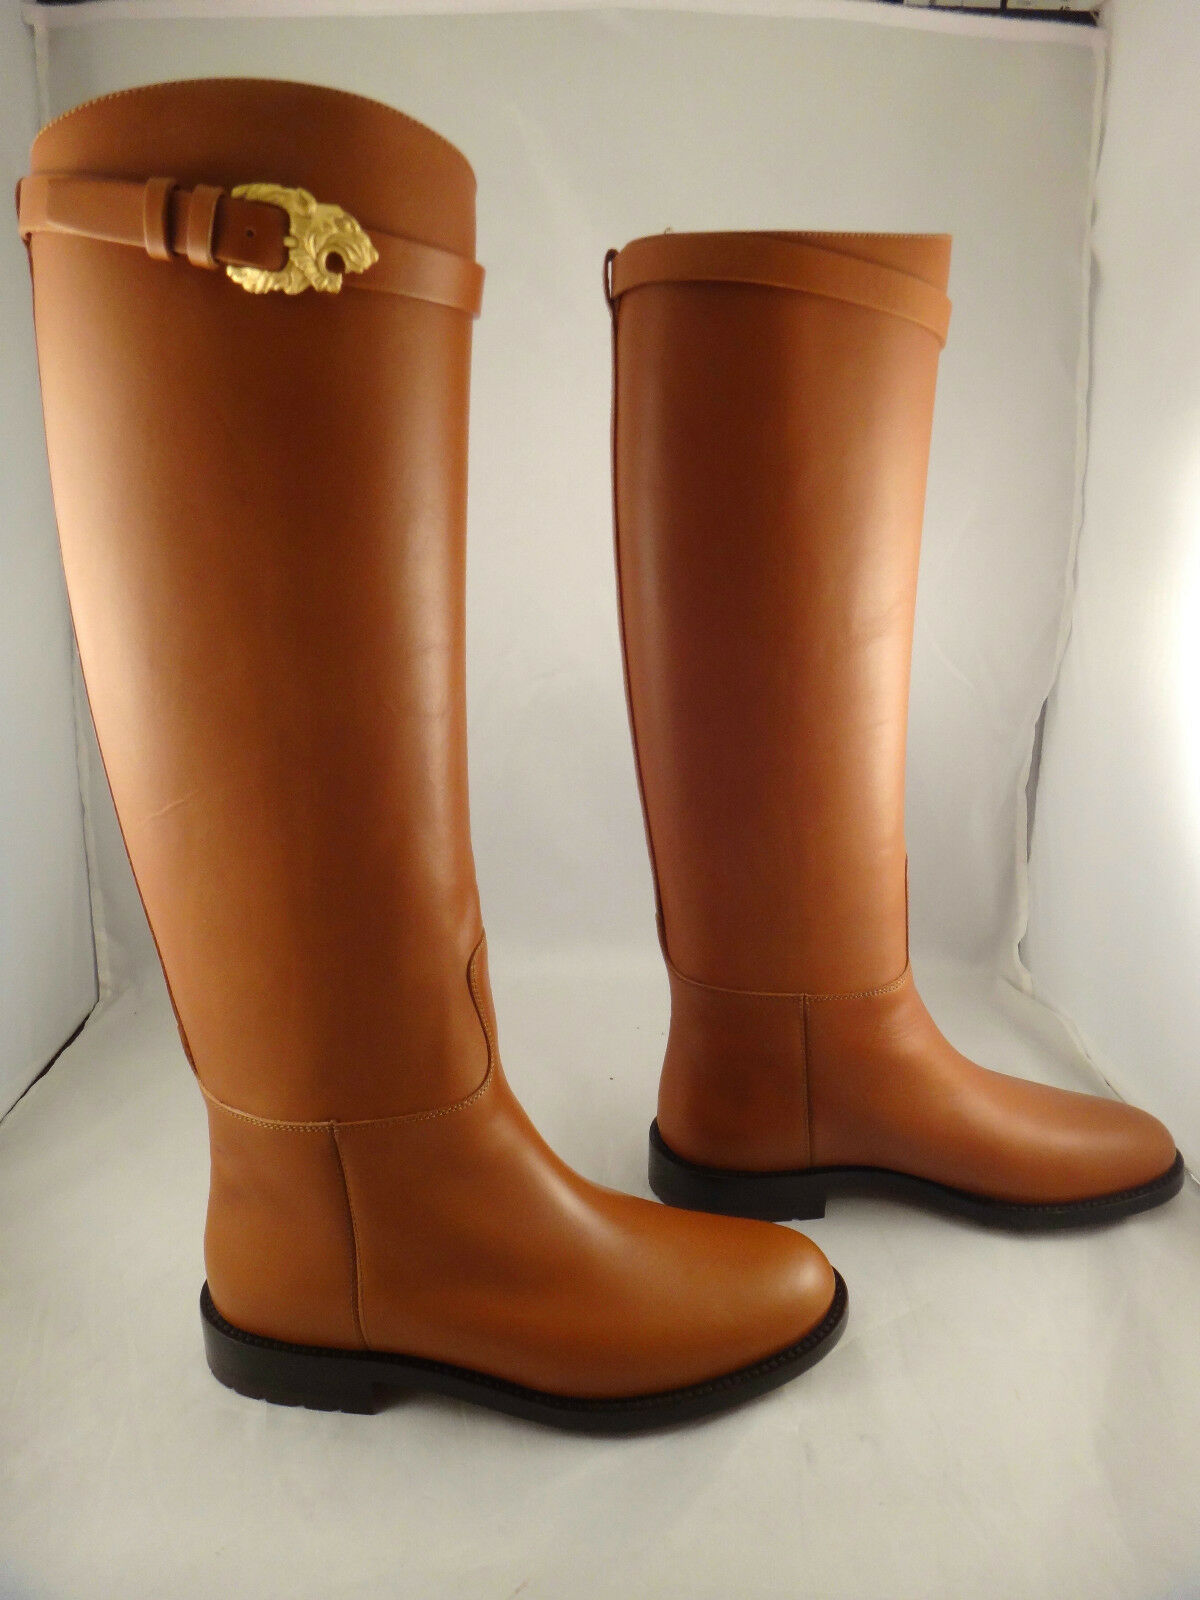 Nuevo En Caja Caja Caja Valentino León oro Animalia Cognac Marrón Cuero de la rodilla botas altas 36  1845  minoristas en línea